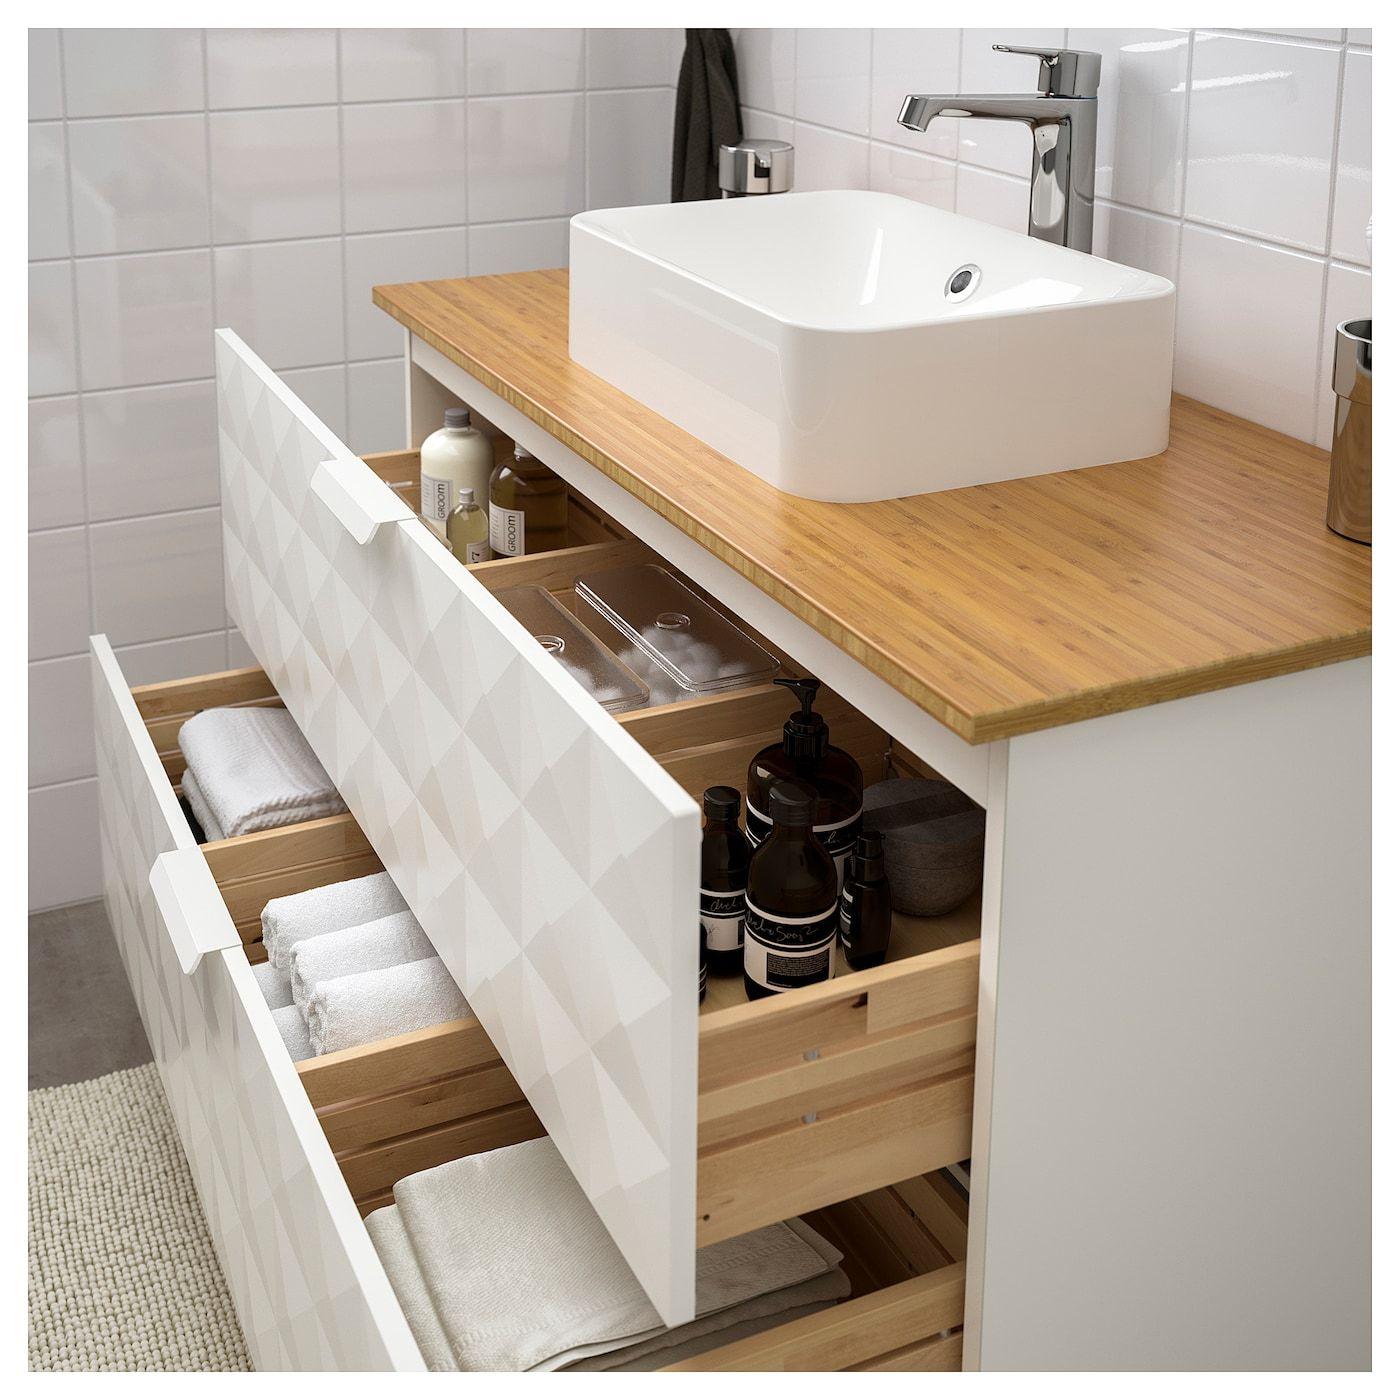 Ikea Us Furniture And Home Furnishings Ikea Godmorgon Sink Cabinet Ikea